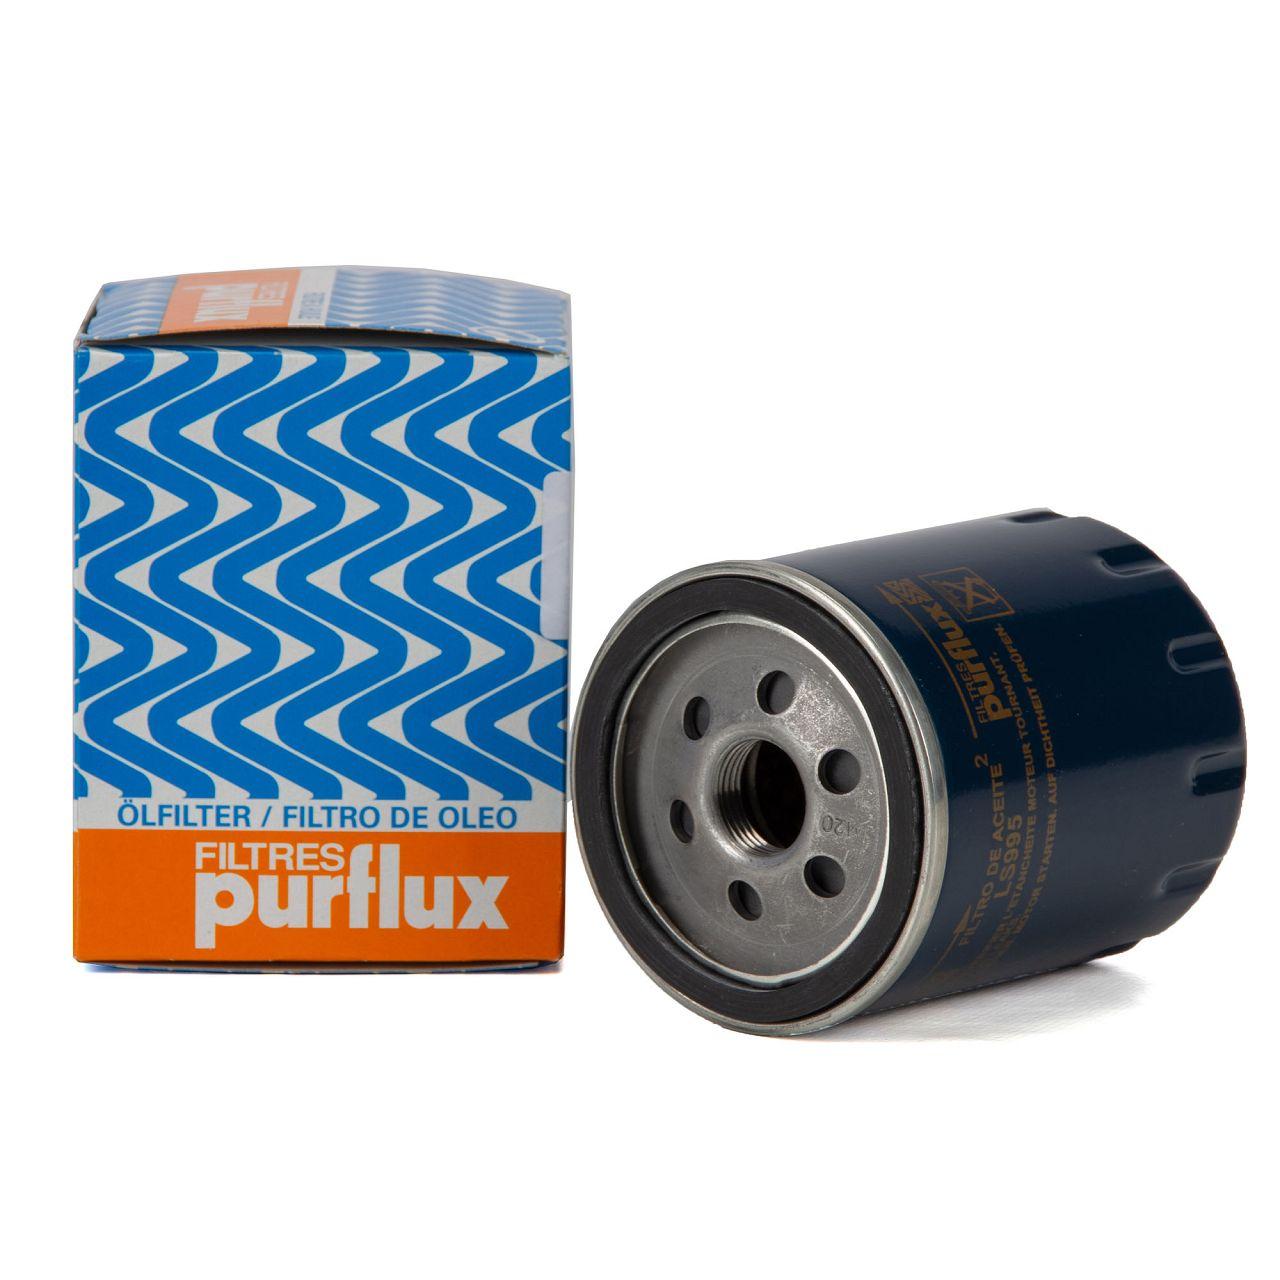 PURFLUX LS995 Ölfilter CITROEN Jumpy Jumper PEUGEOT 508 Boxer Expert 2.0-2.2 BlueHDi